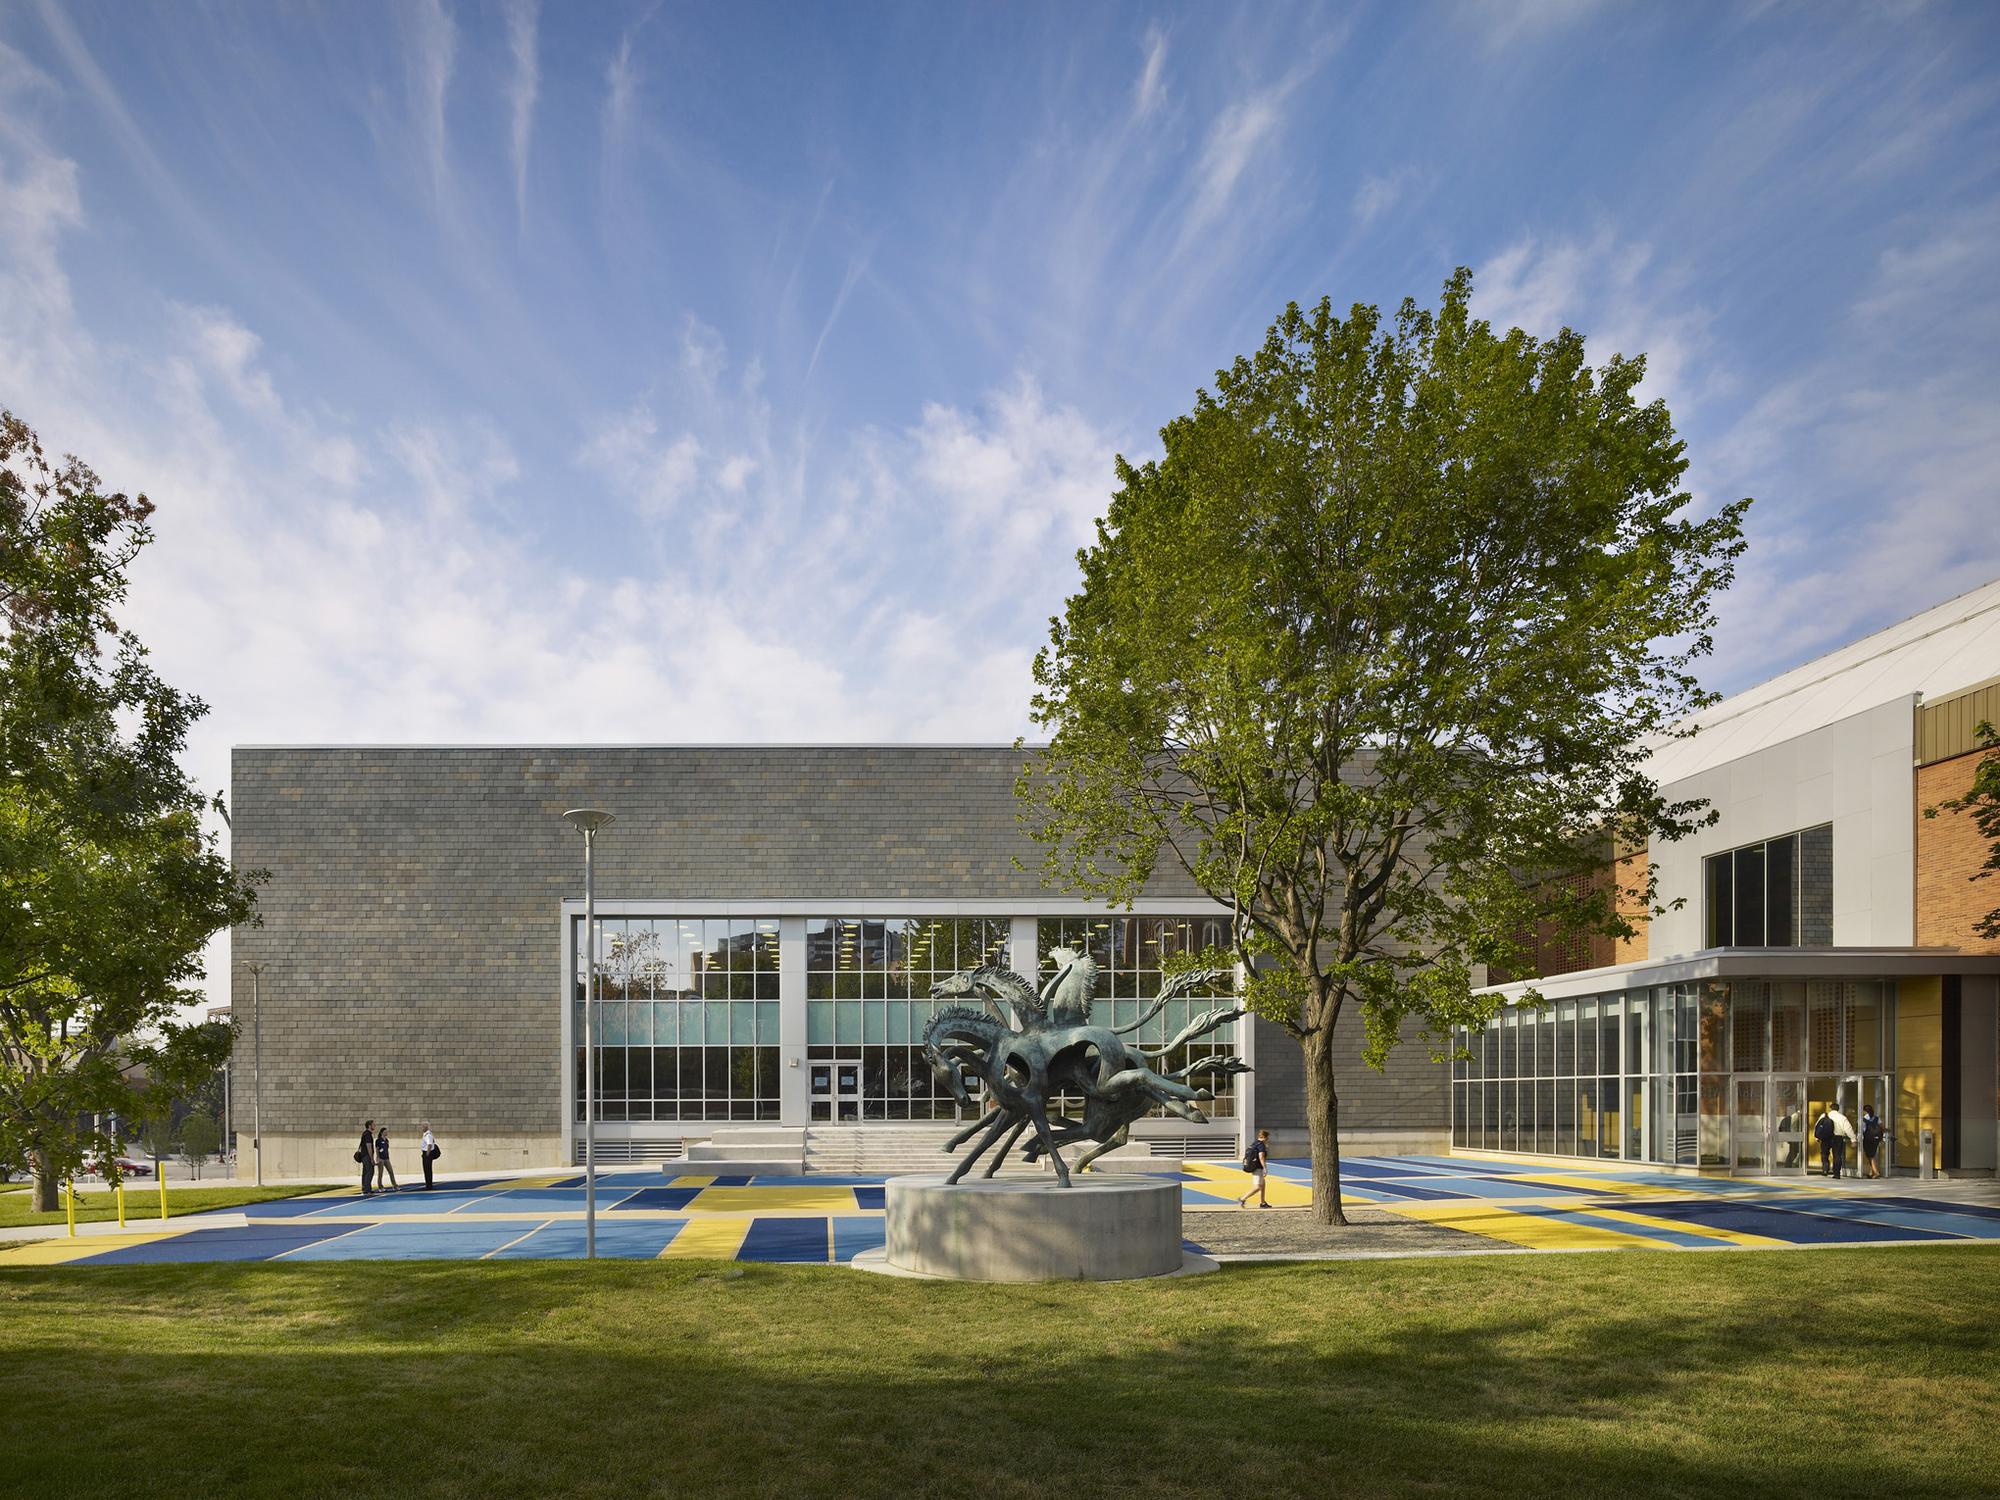 The Drexel University Daskalakis Athletic Center / Sasaki Associates